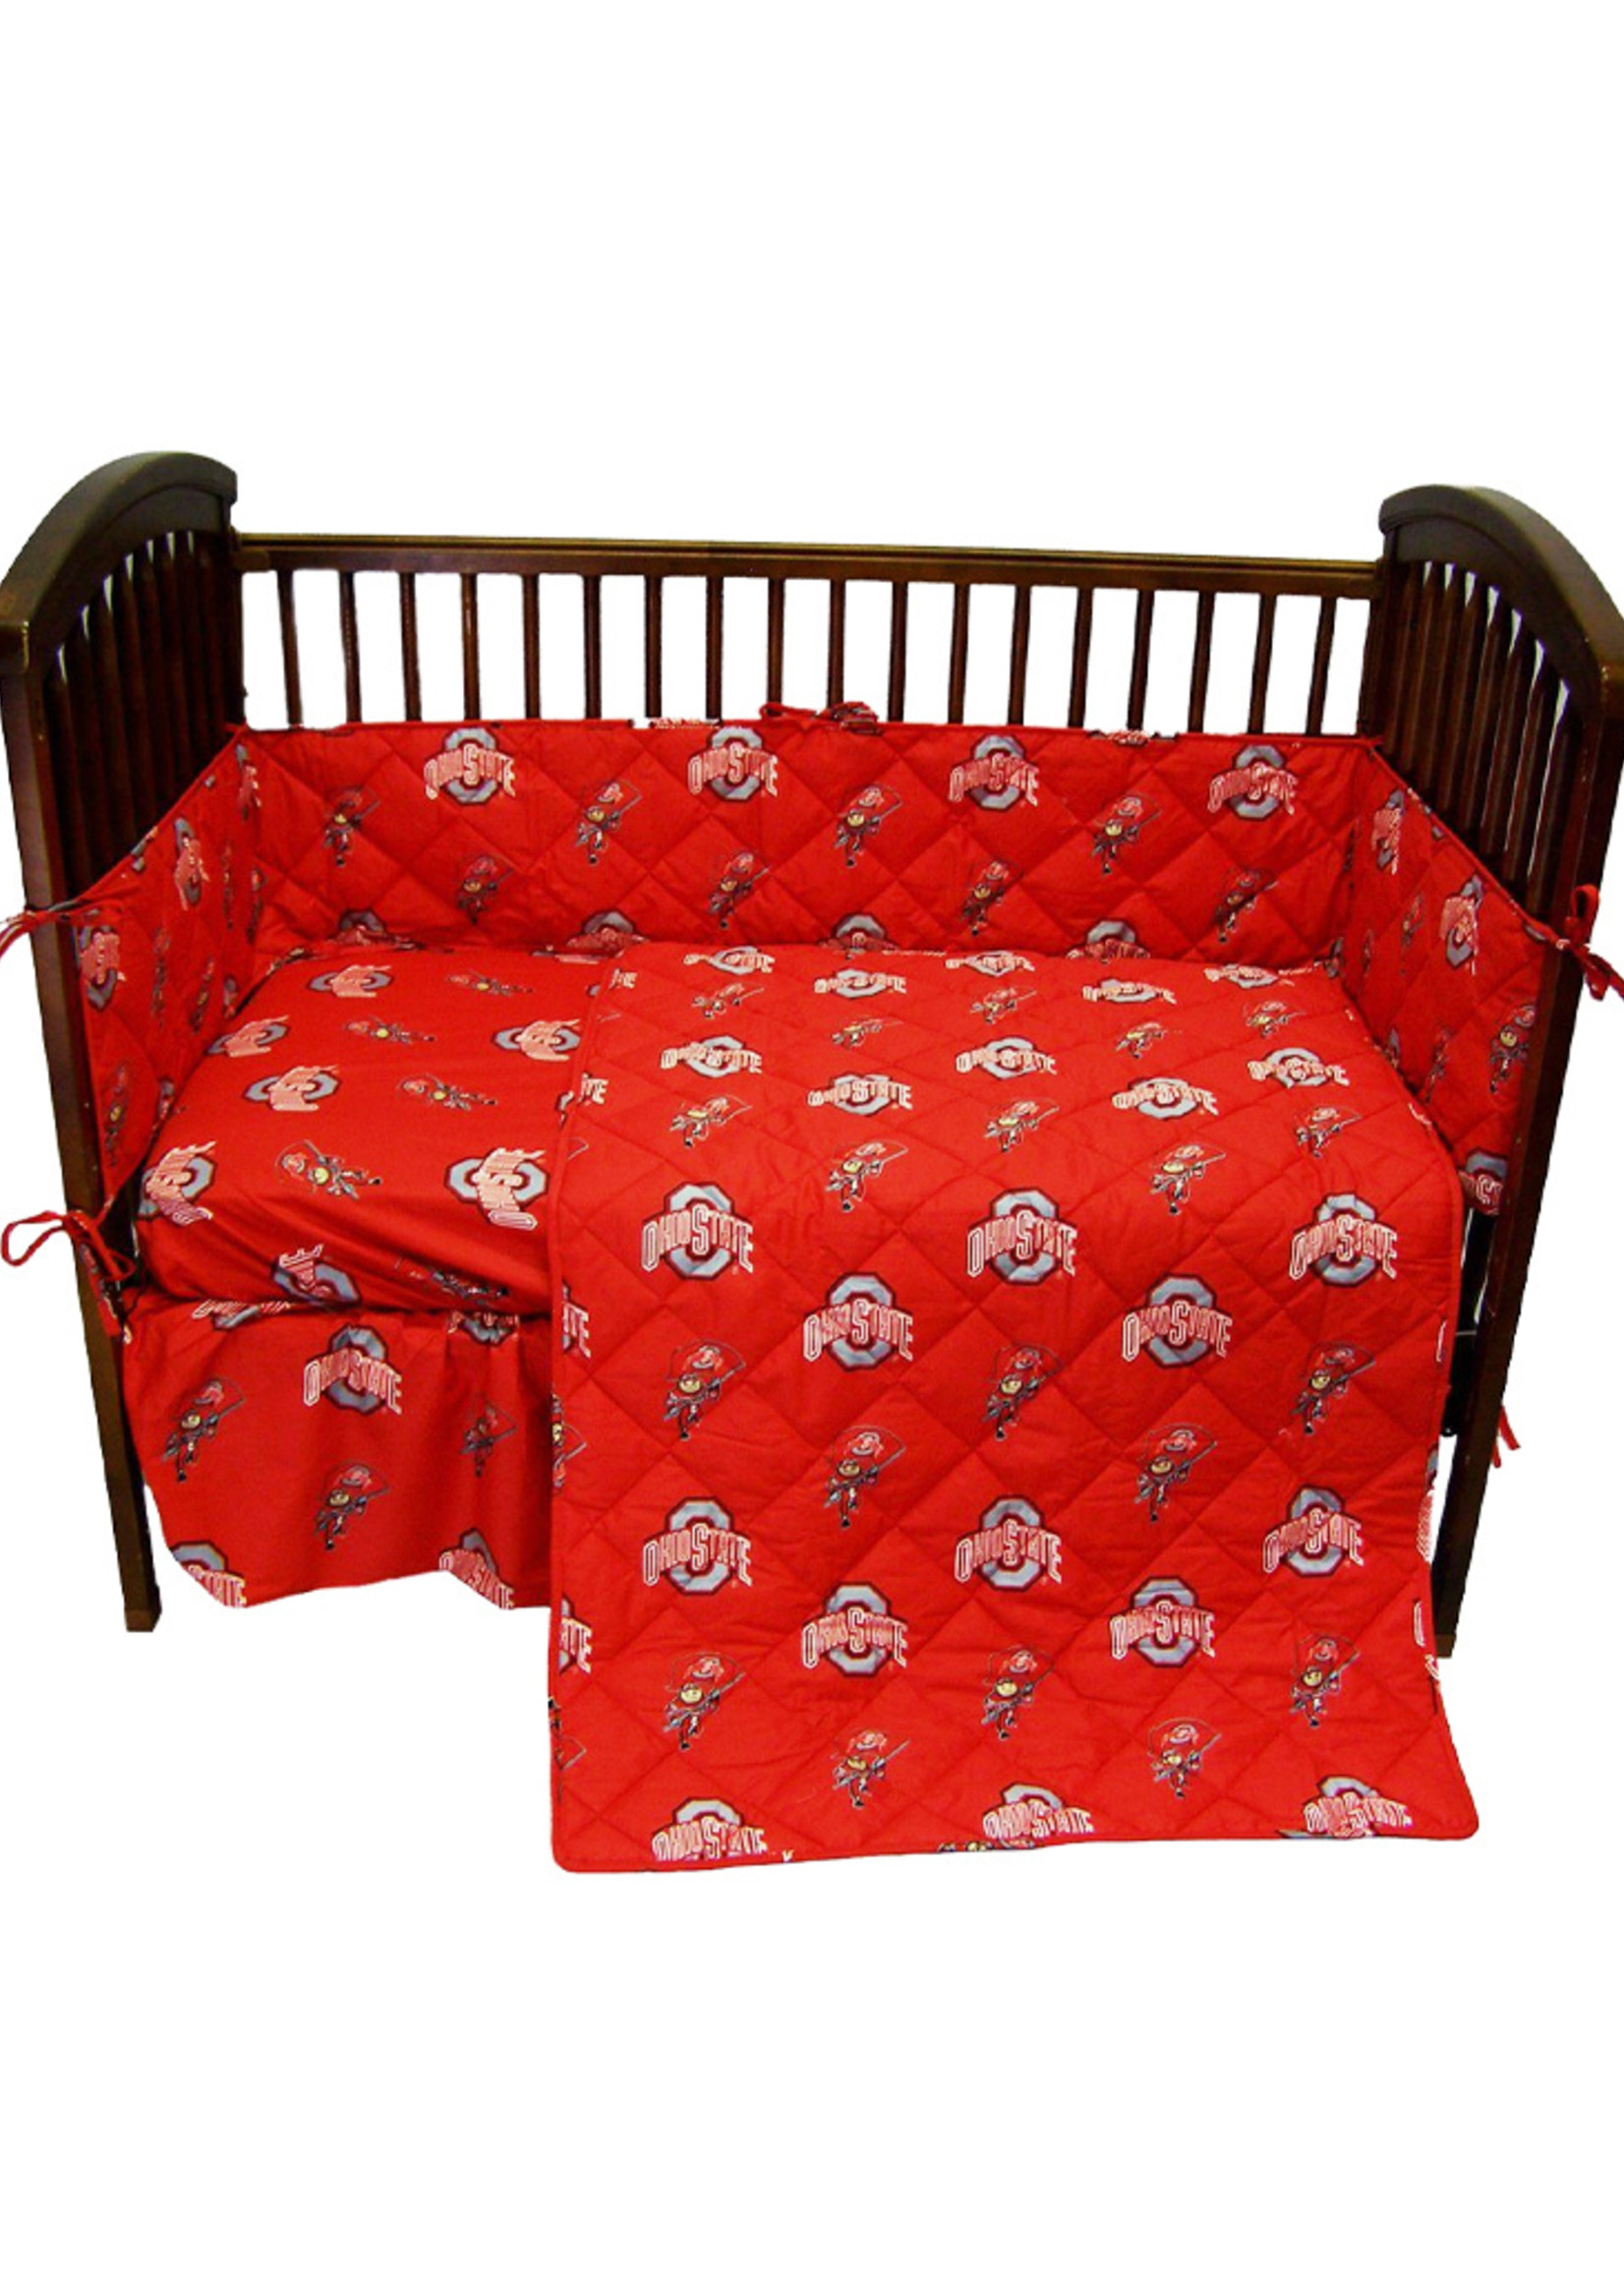 Ohio State Buckeyes Crib Set